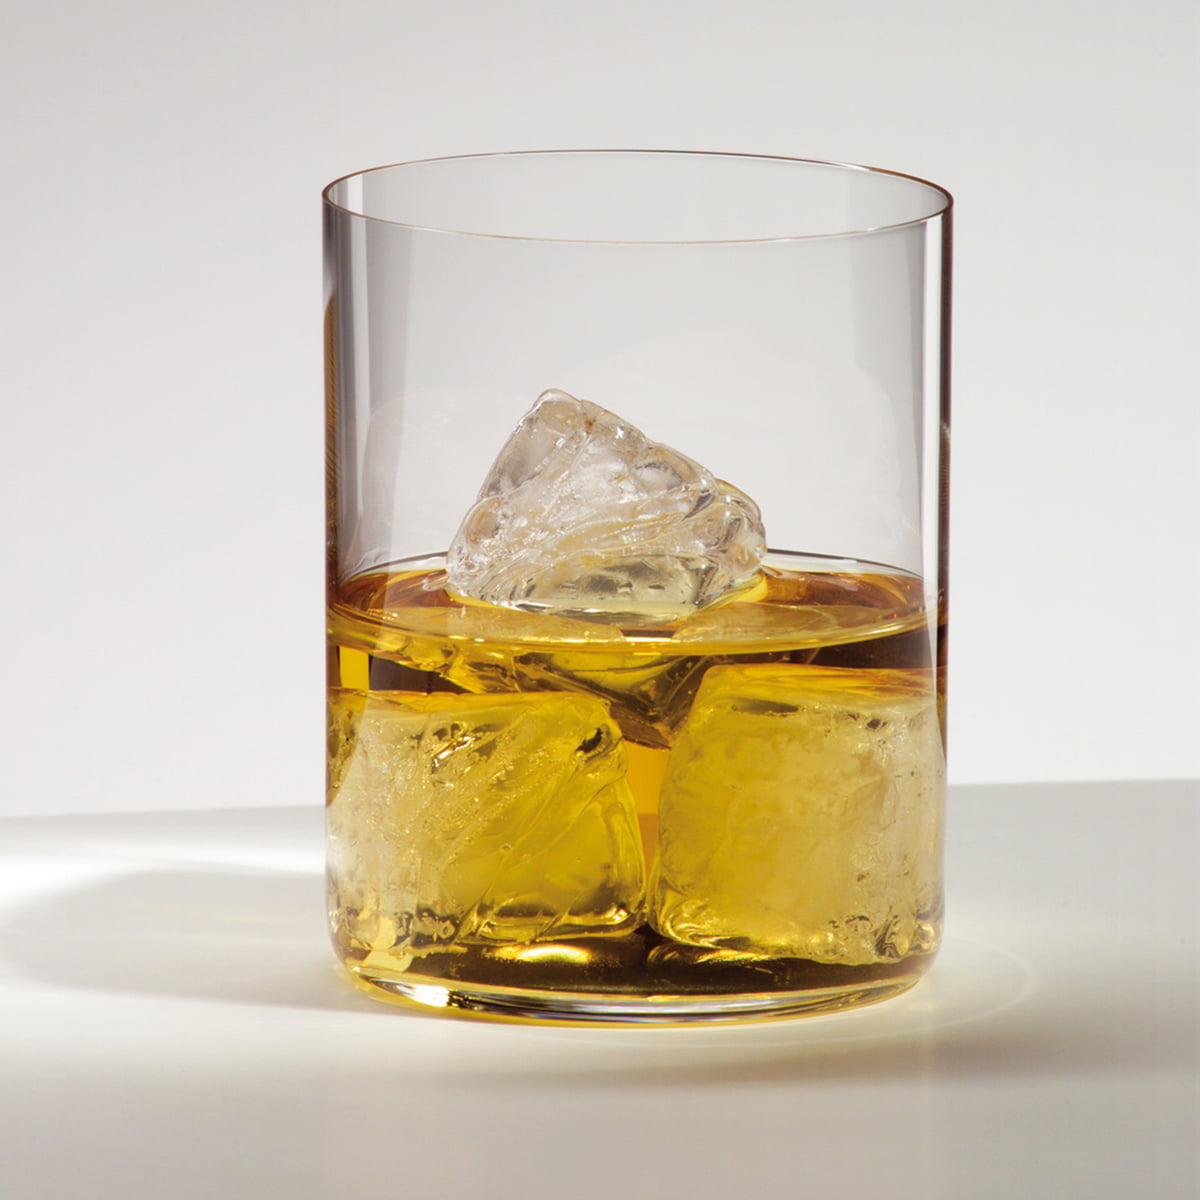 o wine whisky glass set of 2 by riedel. Black Bedroom Furniture Sets. Home Design Ideas